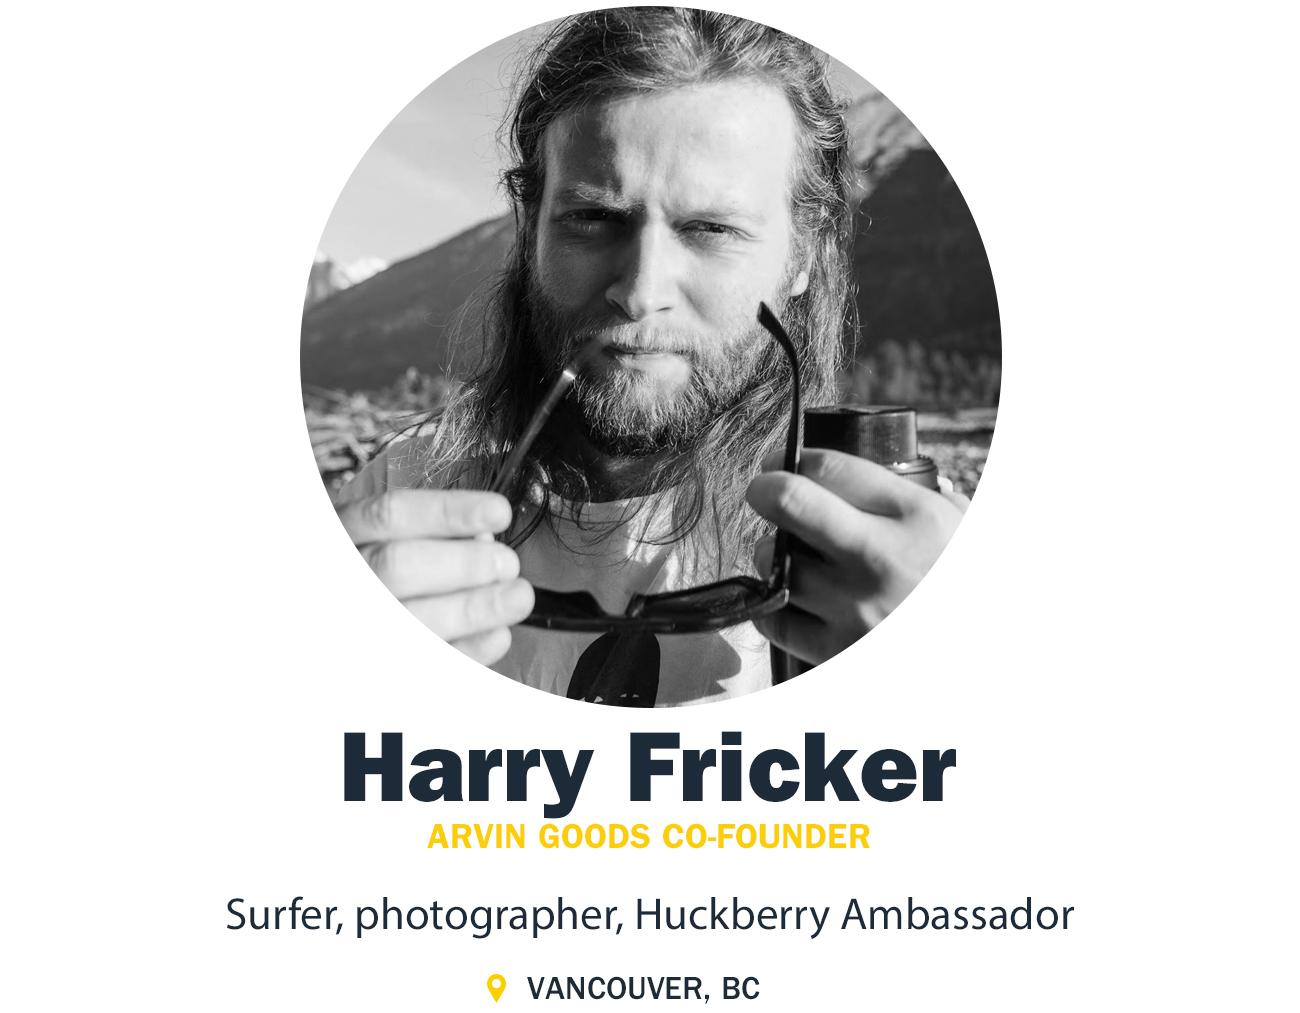 Harry Fricker